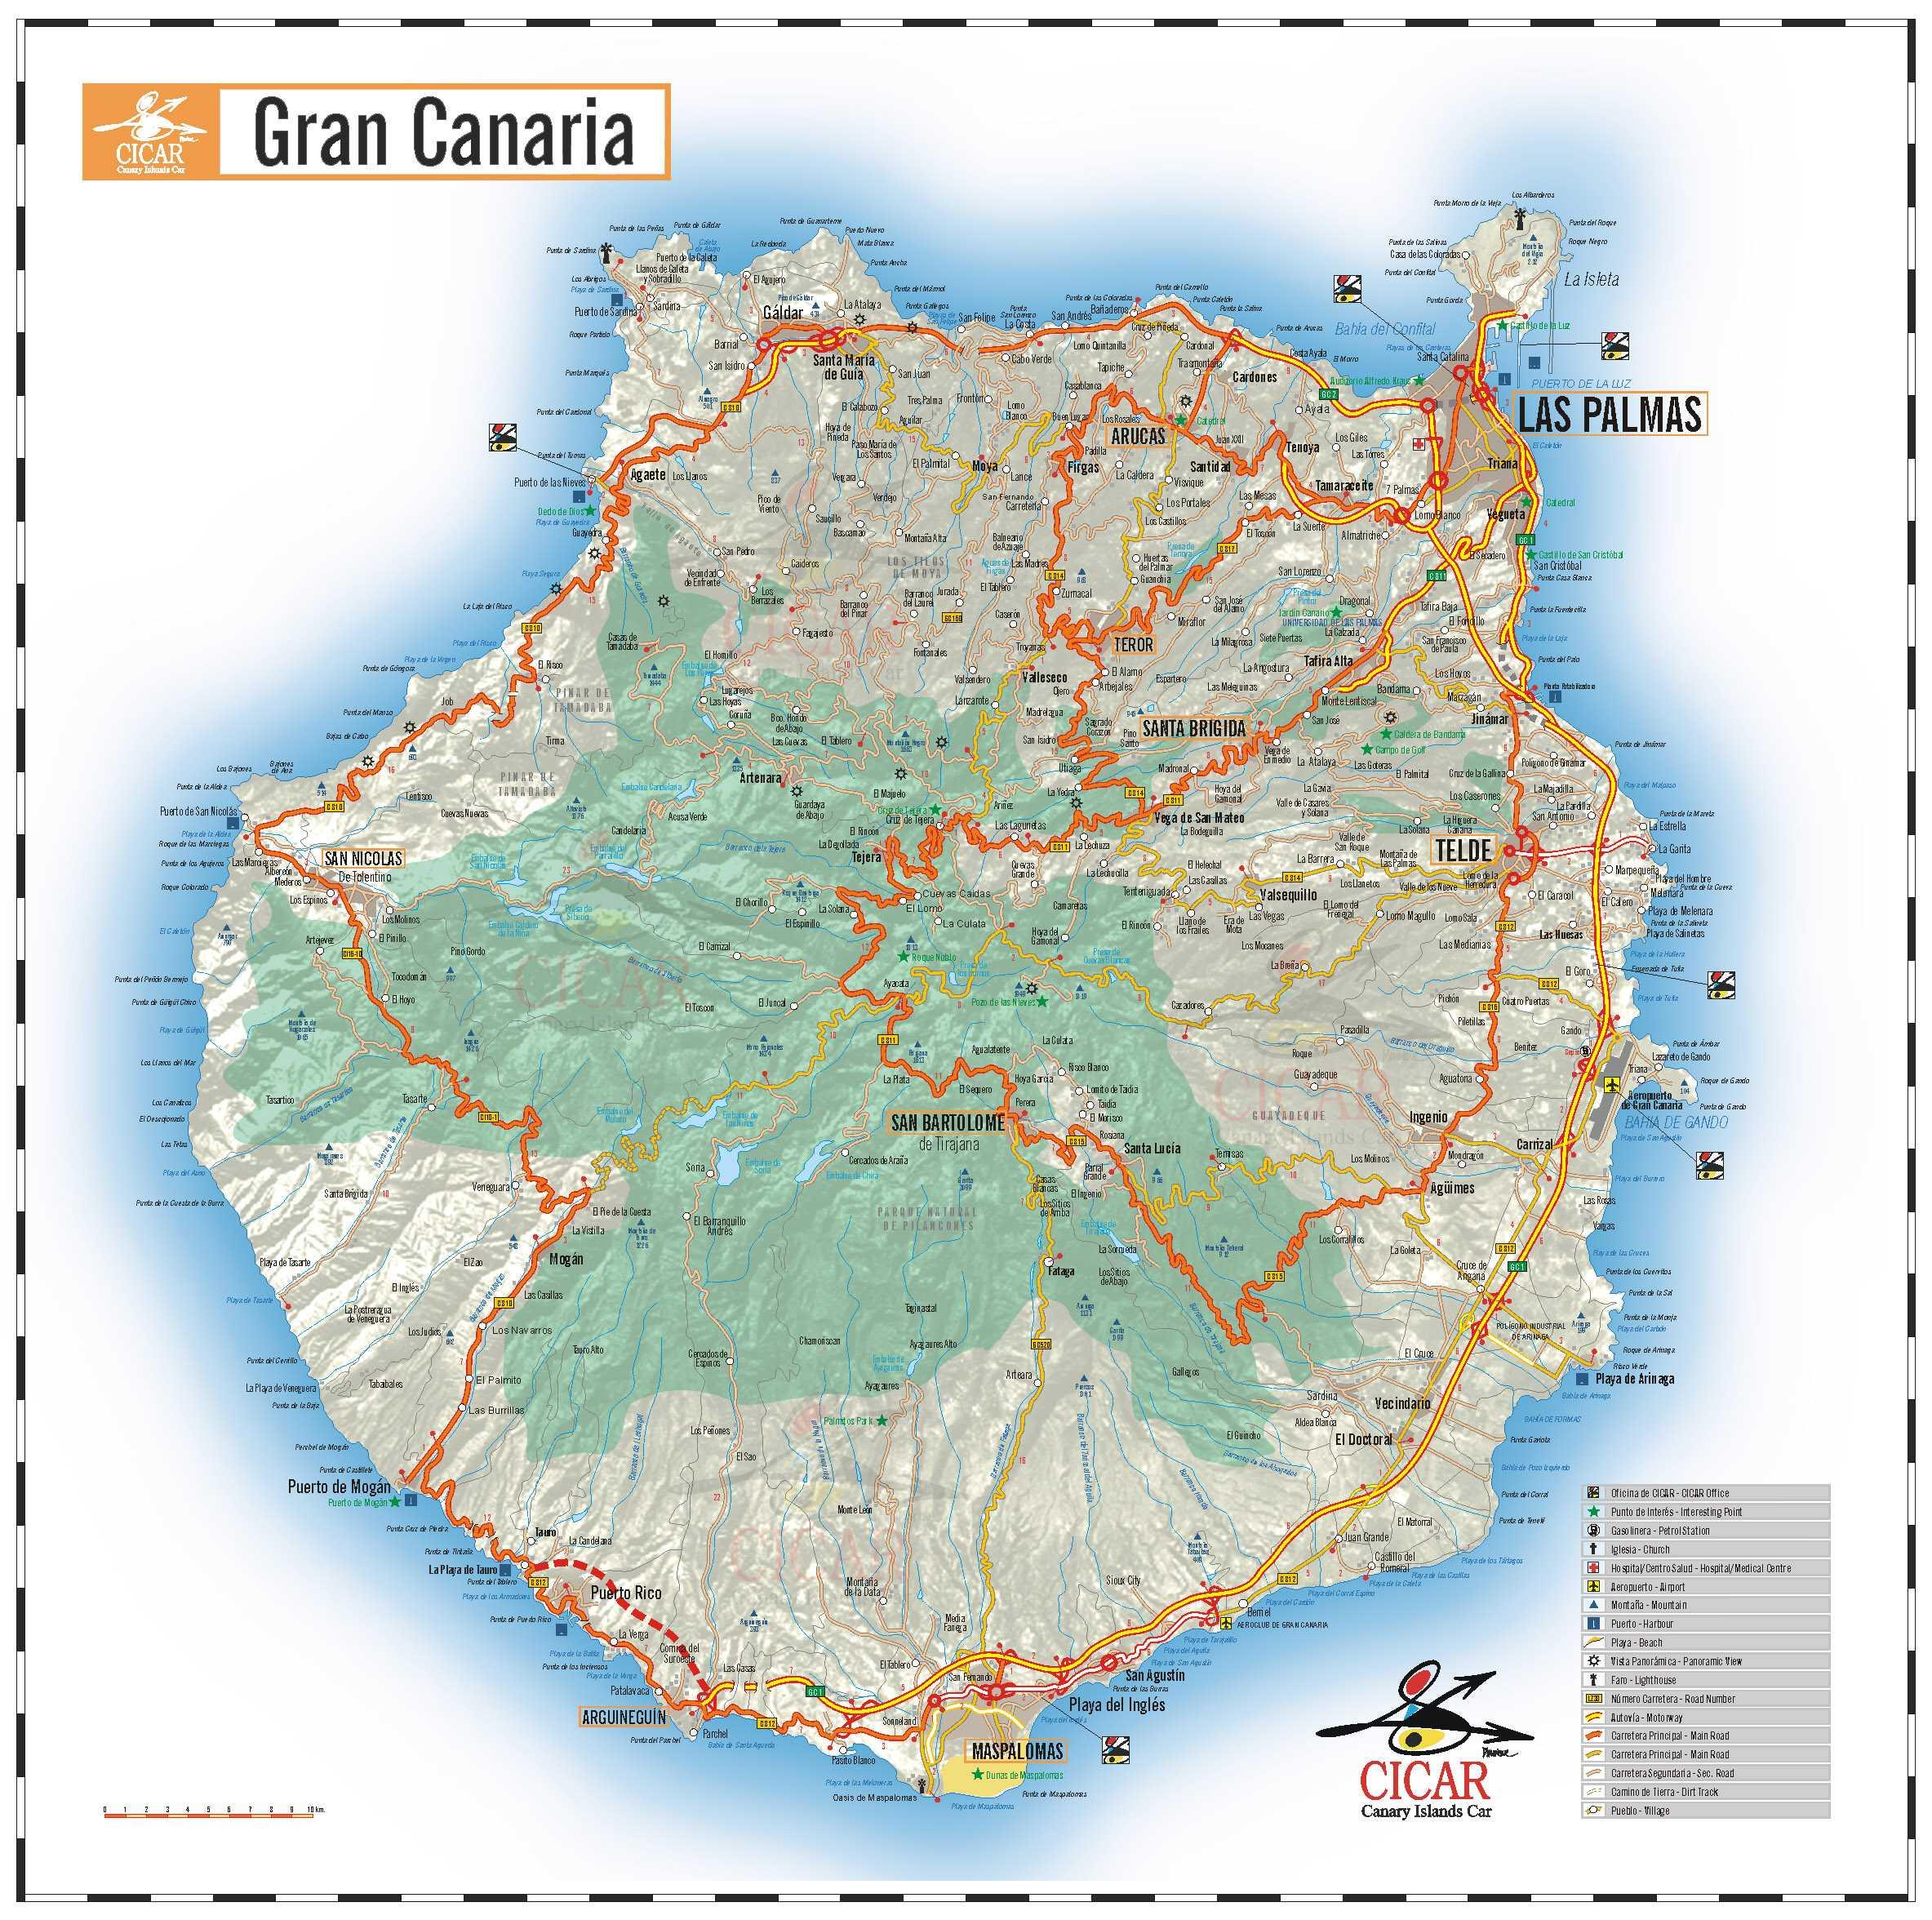 Kanarske Ostrovy Mapa Tenerife Gran Canaria Mapa Fuerteventura